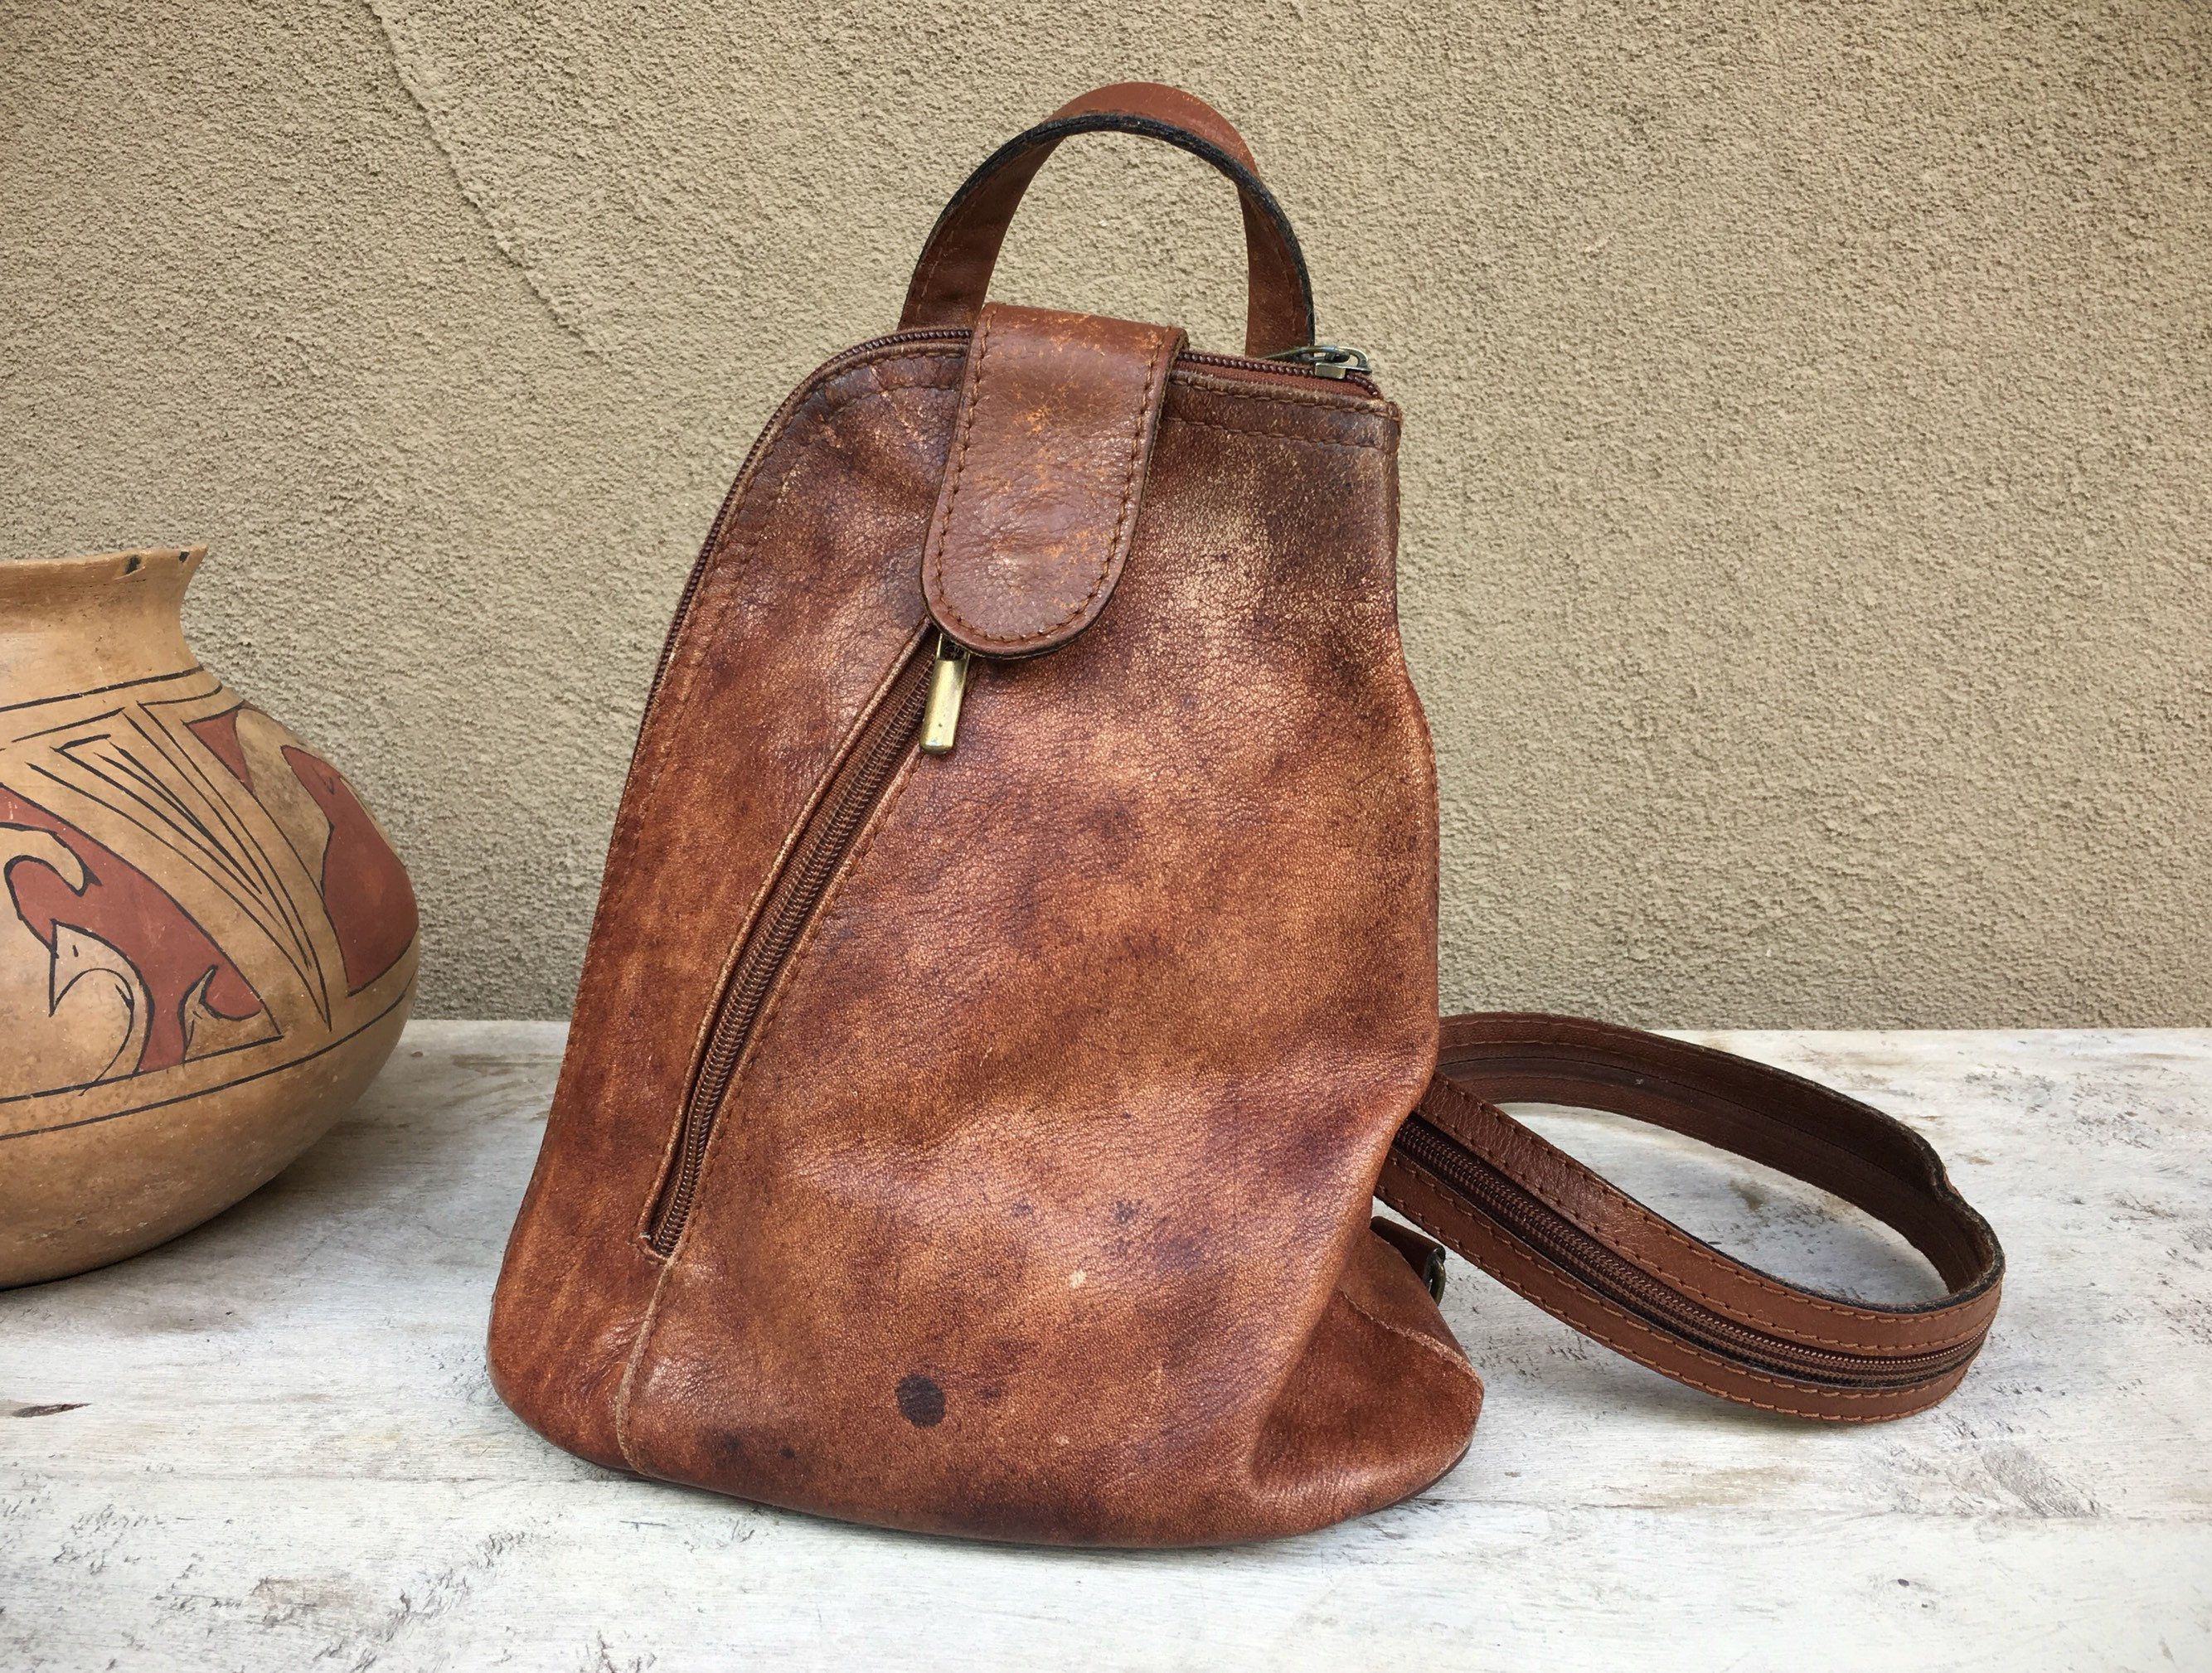 91f653e1cd60 Vintage Small Sling Bag Chestnut Brown Italian Leather Single Strap Backpack  Purse for Women or Men